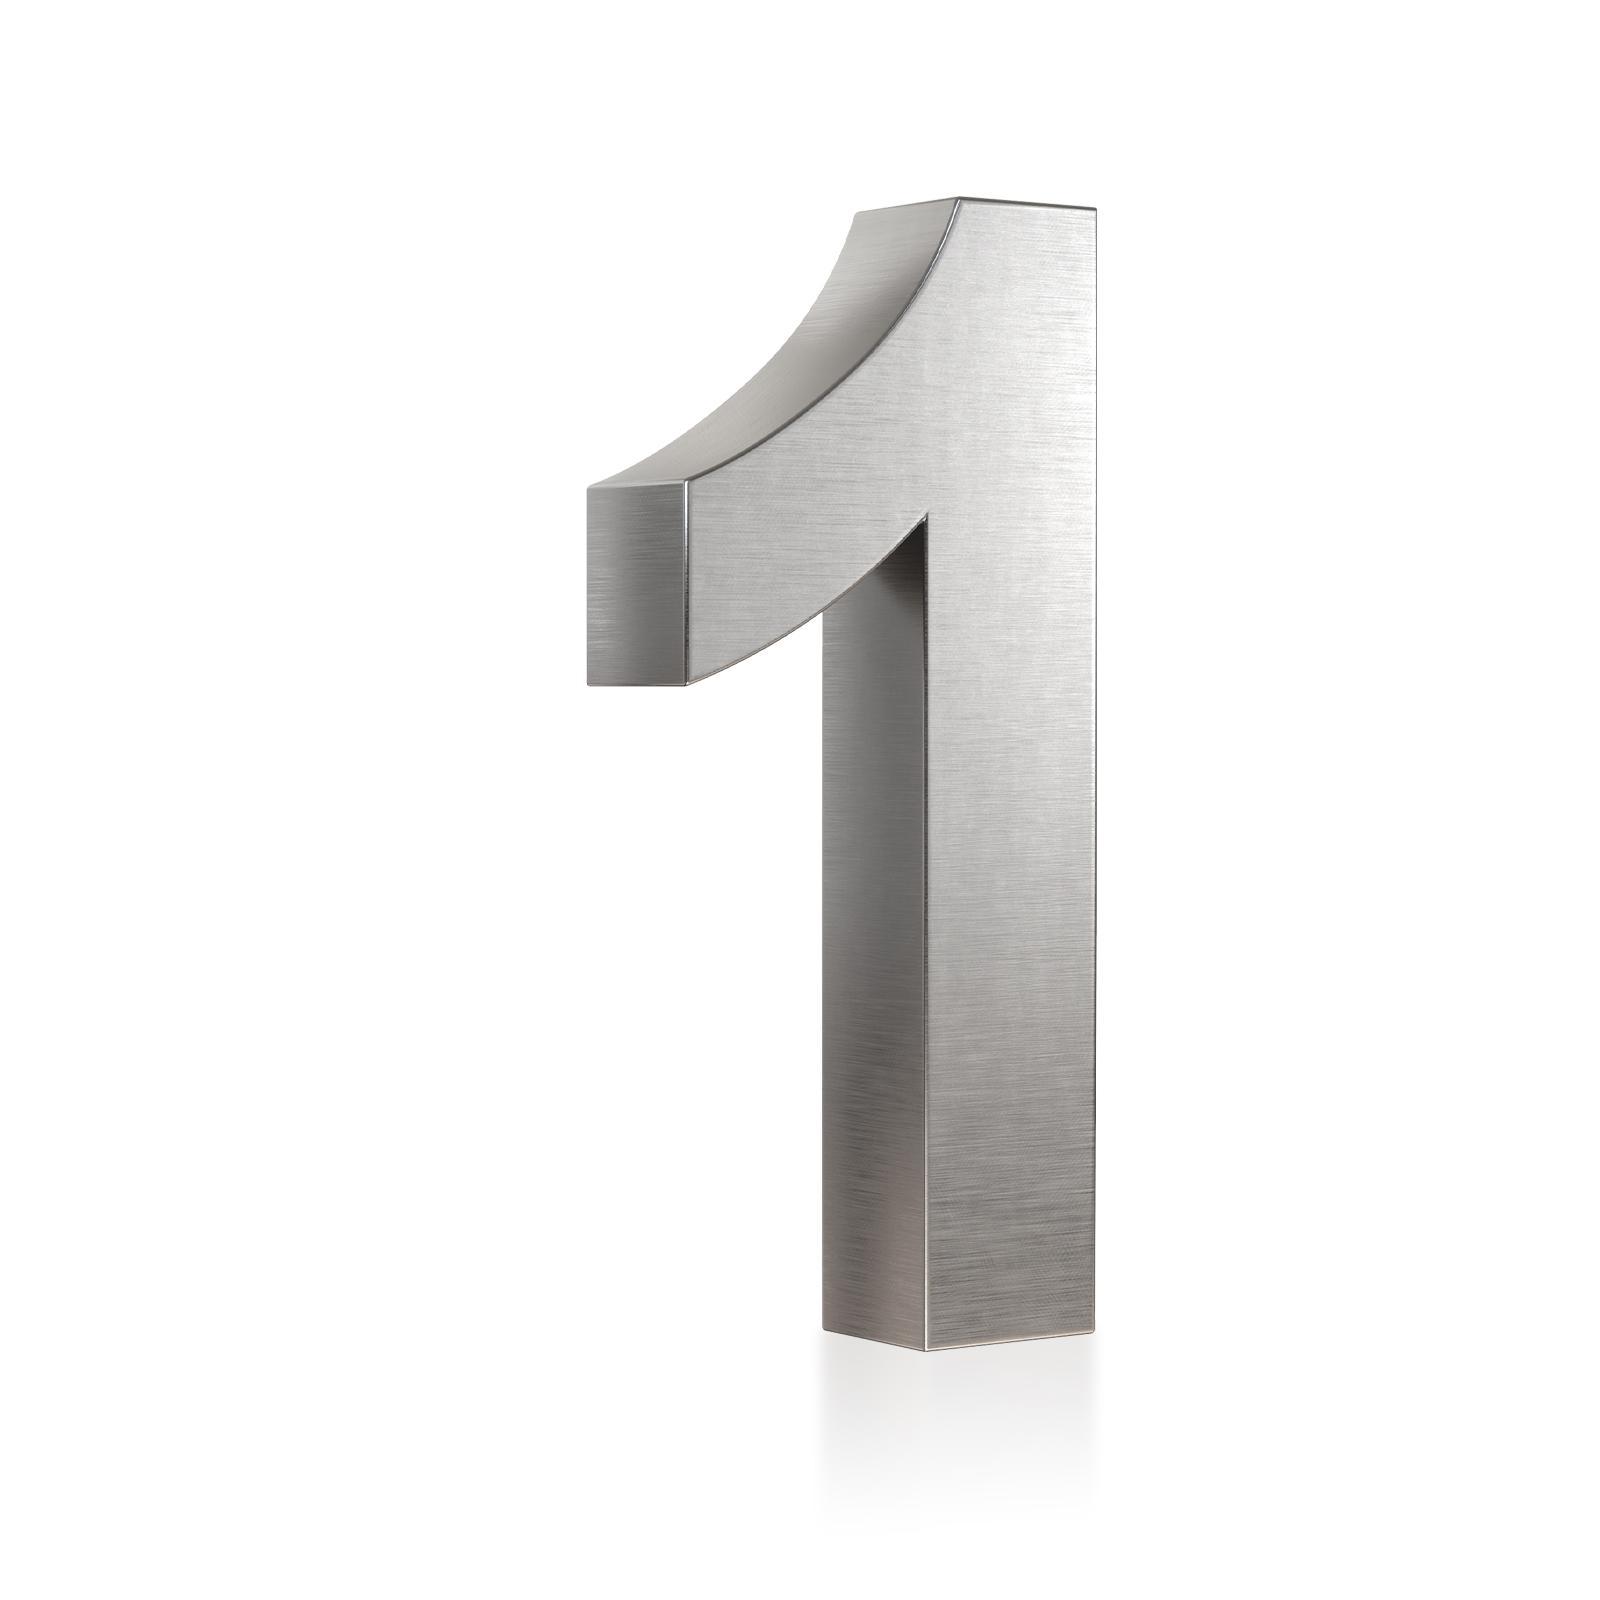 3D Hausnummer 1 Edelstahl in 3D Design Arial V2A